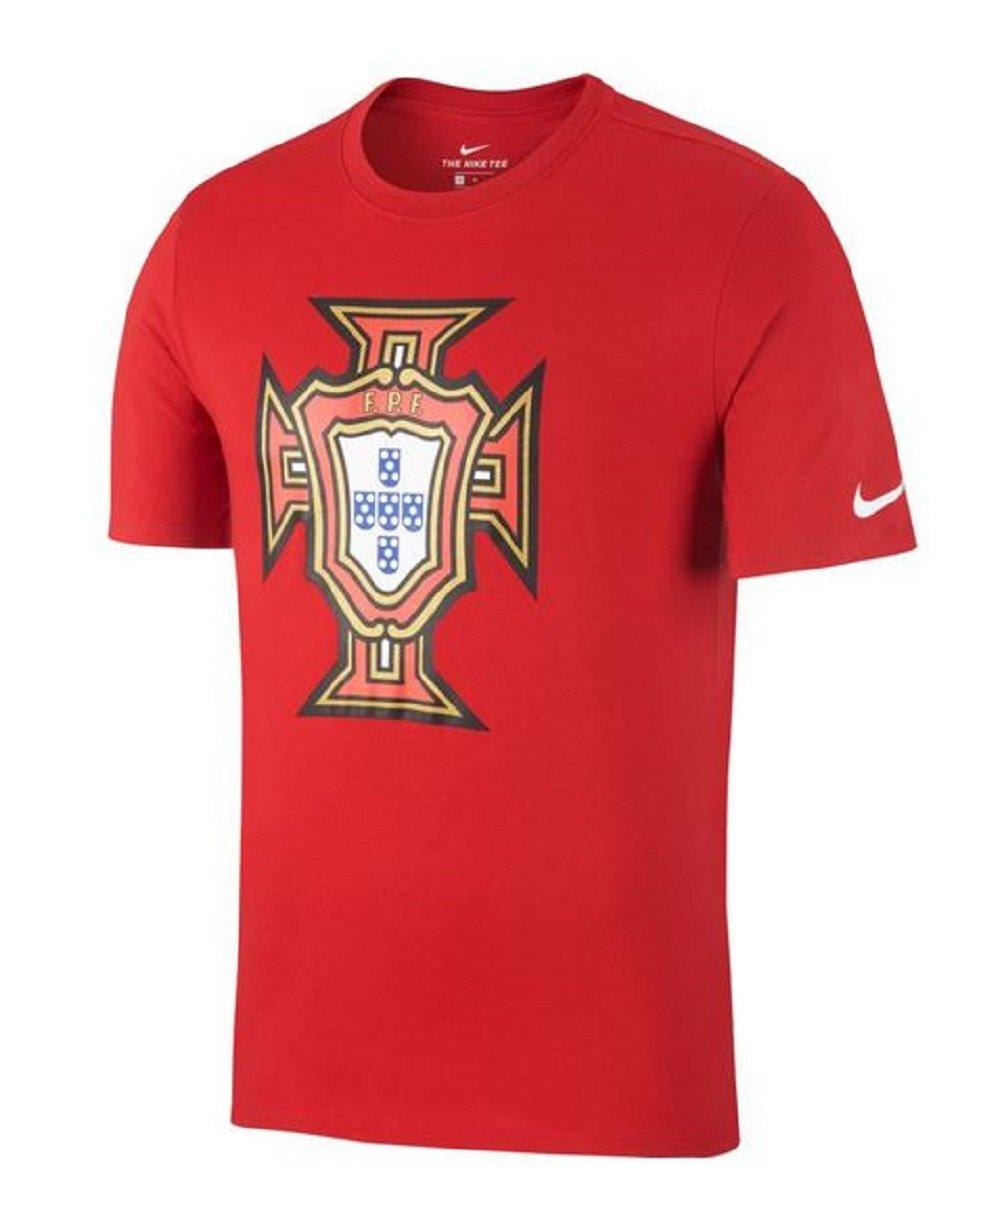 Nike PSF M NK Tee Evergreen Crest, T-Shirt Herren